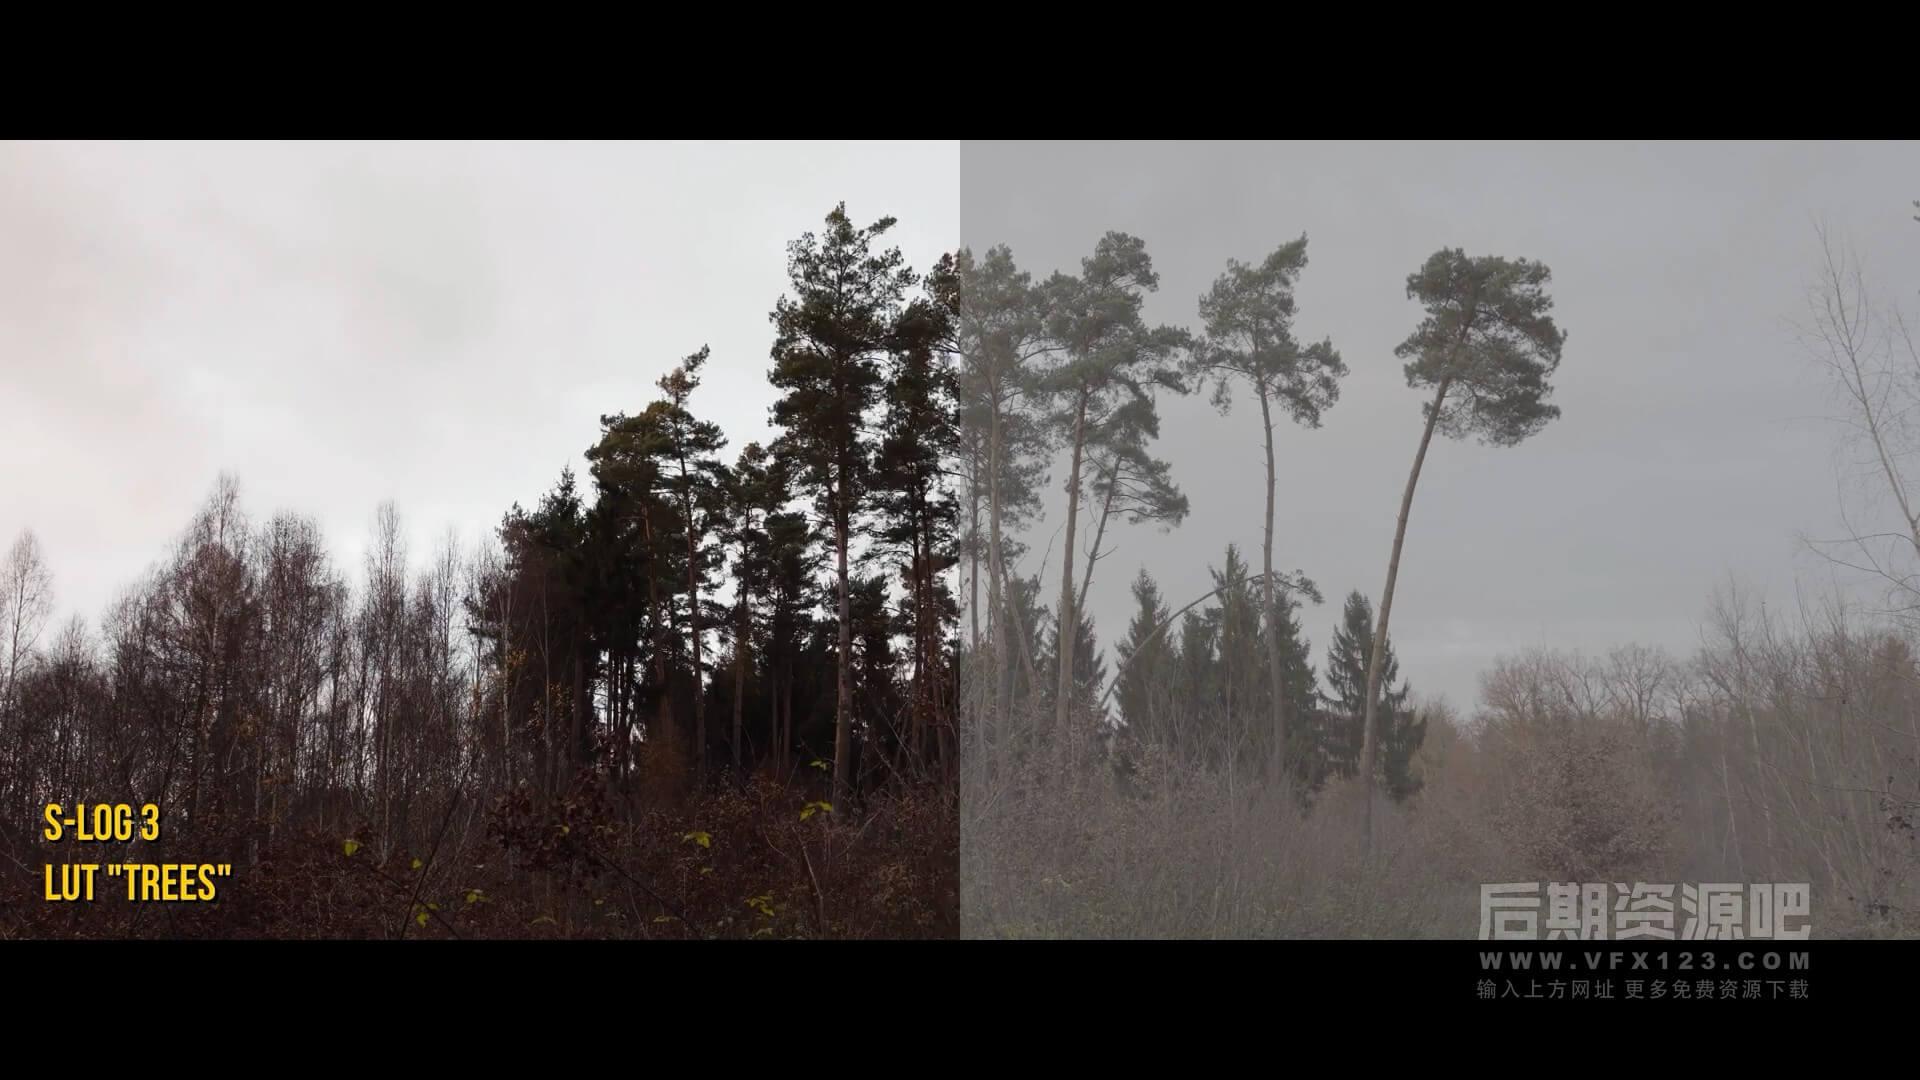 LUTs预设 7个秋季风景旅拍常用色彩还原调色预设 Autumn LUT Pack